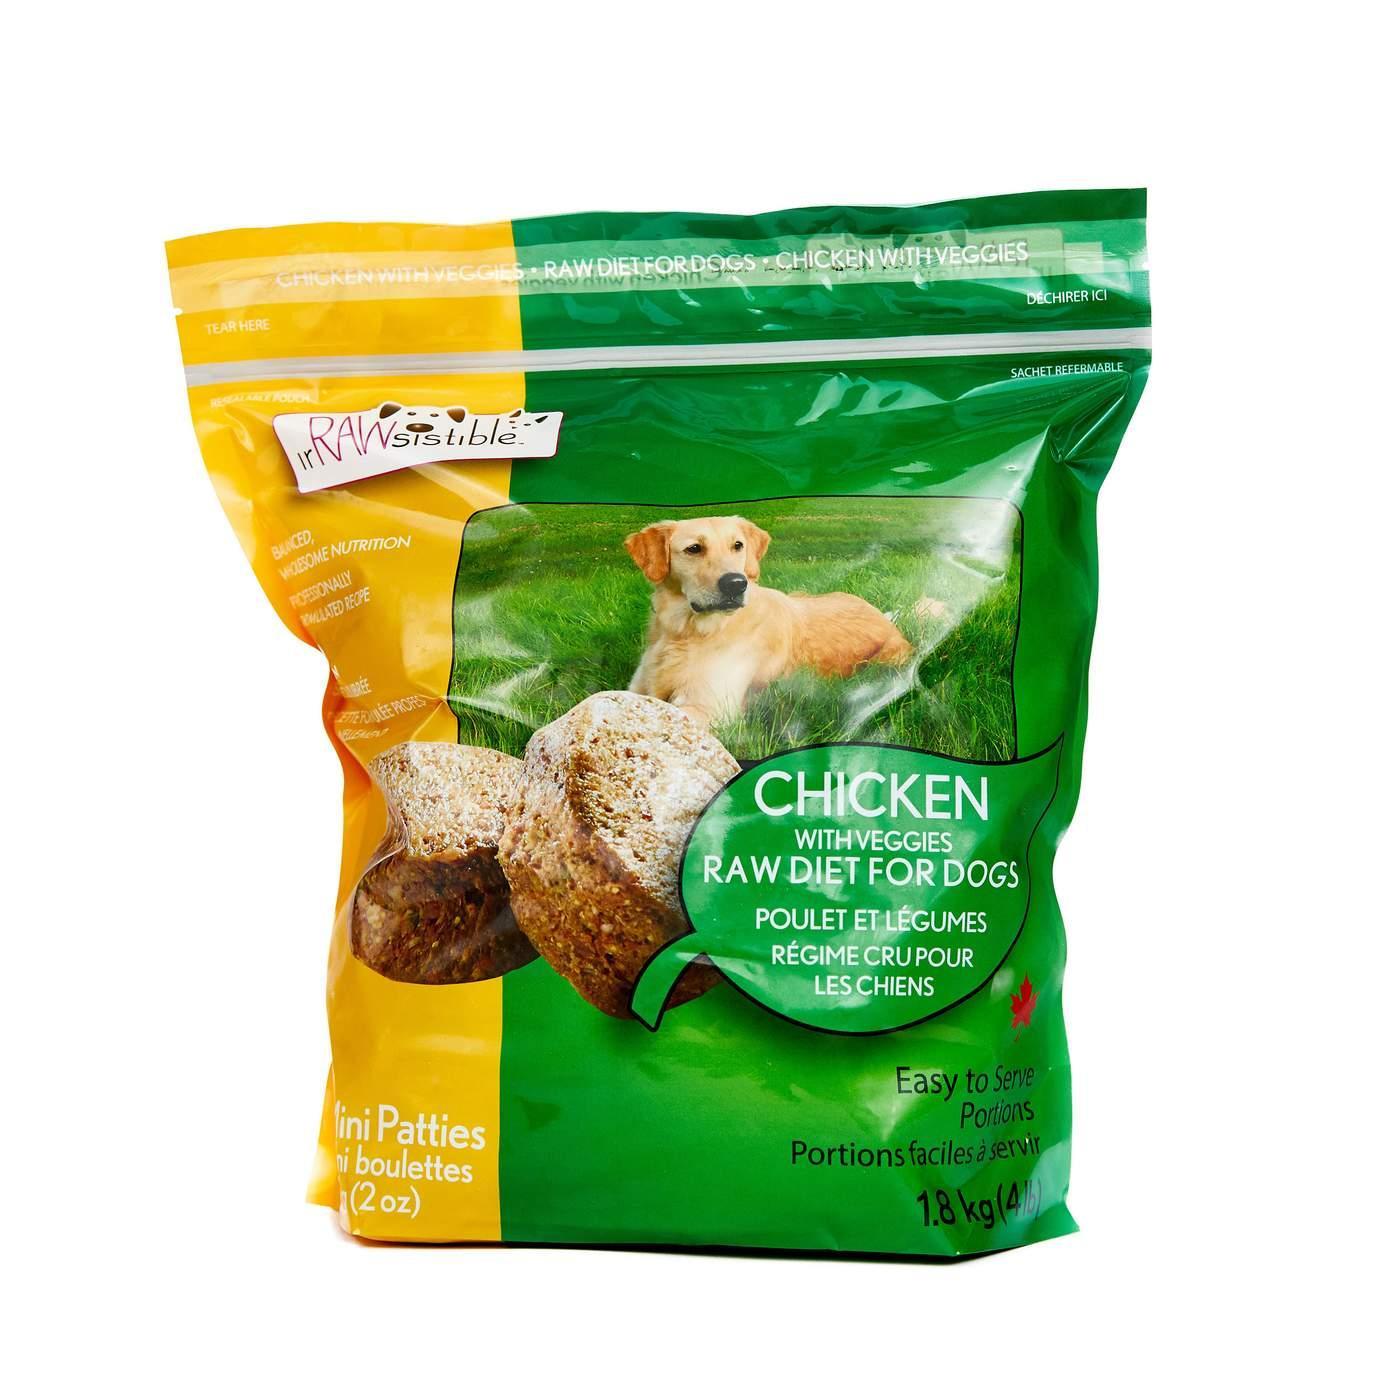 IrRAWsistible Boneless Chicken Mini Patties Frozen Dog Food, 1.8-kg